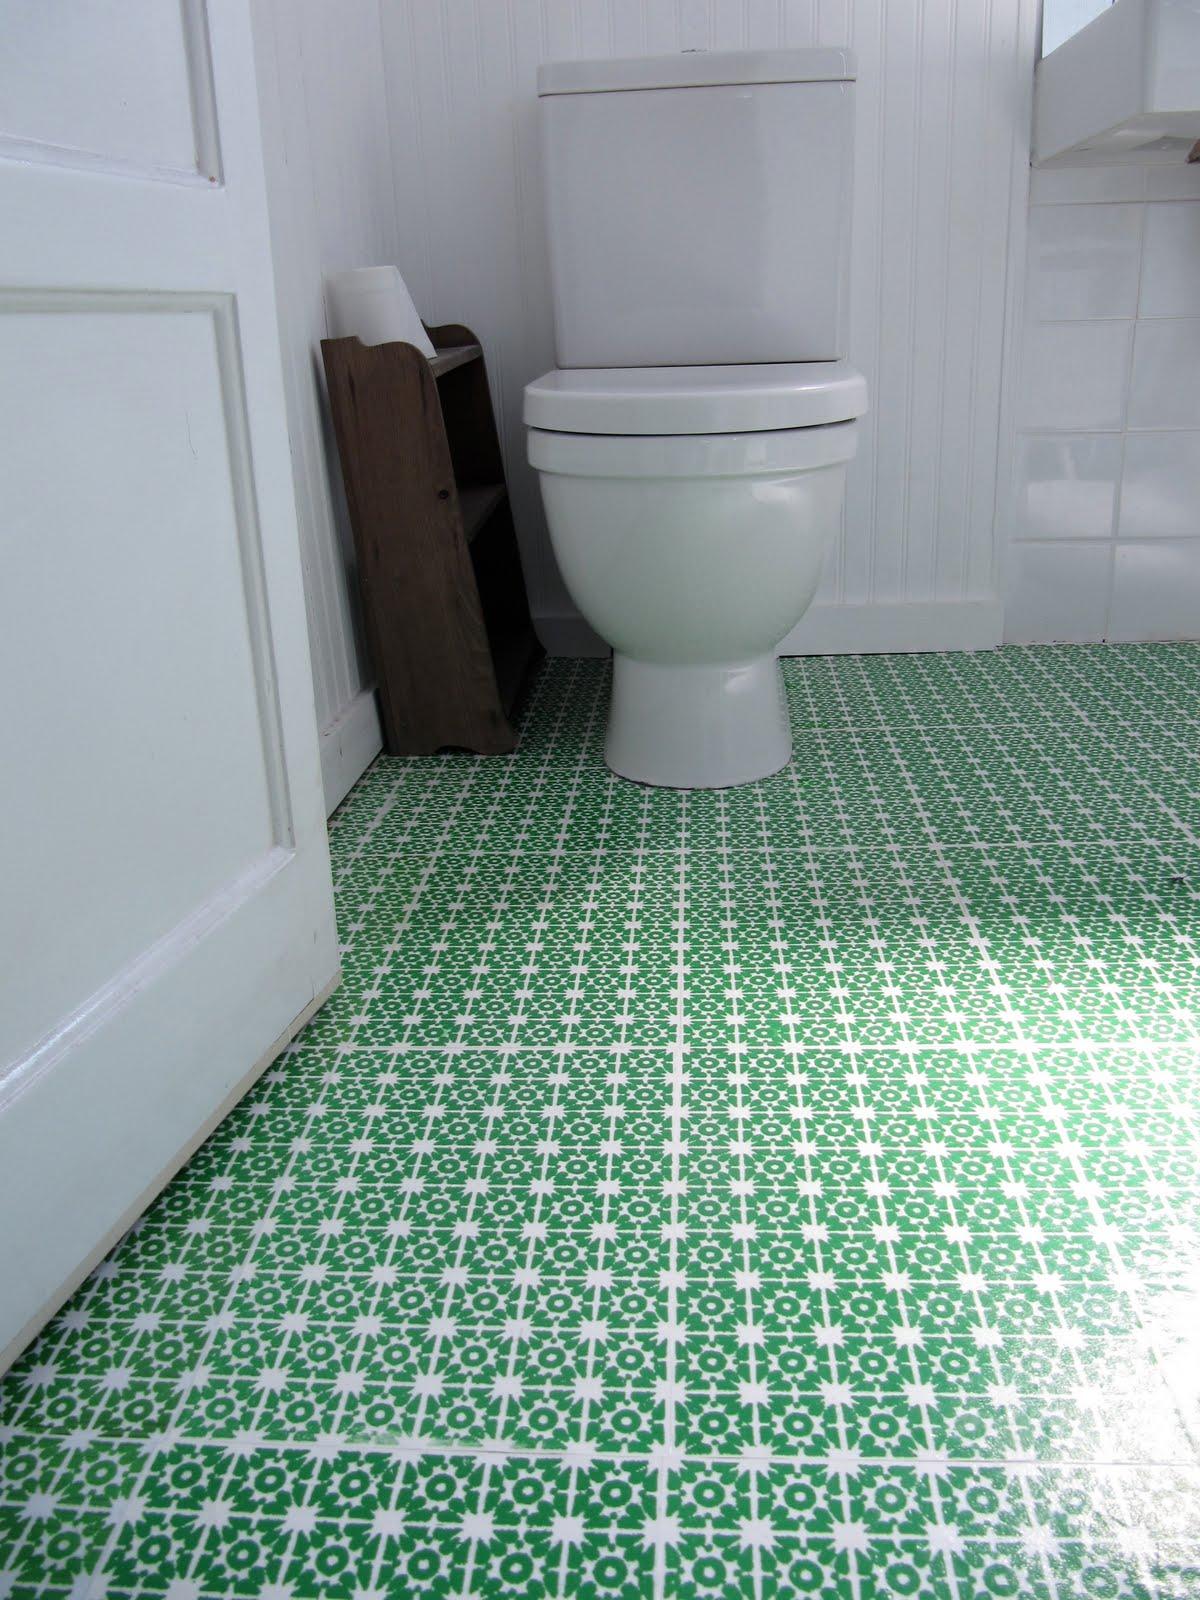 Lazy Cozy My Fancy Bathroom Floor Rh Lazycozy Rachellovecameron Blo Com